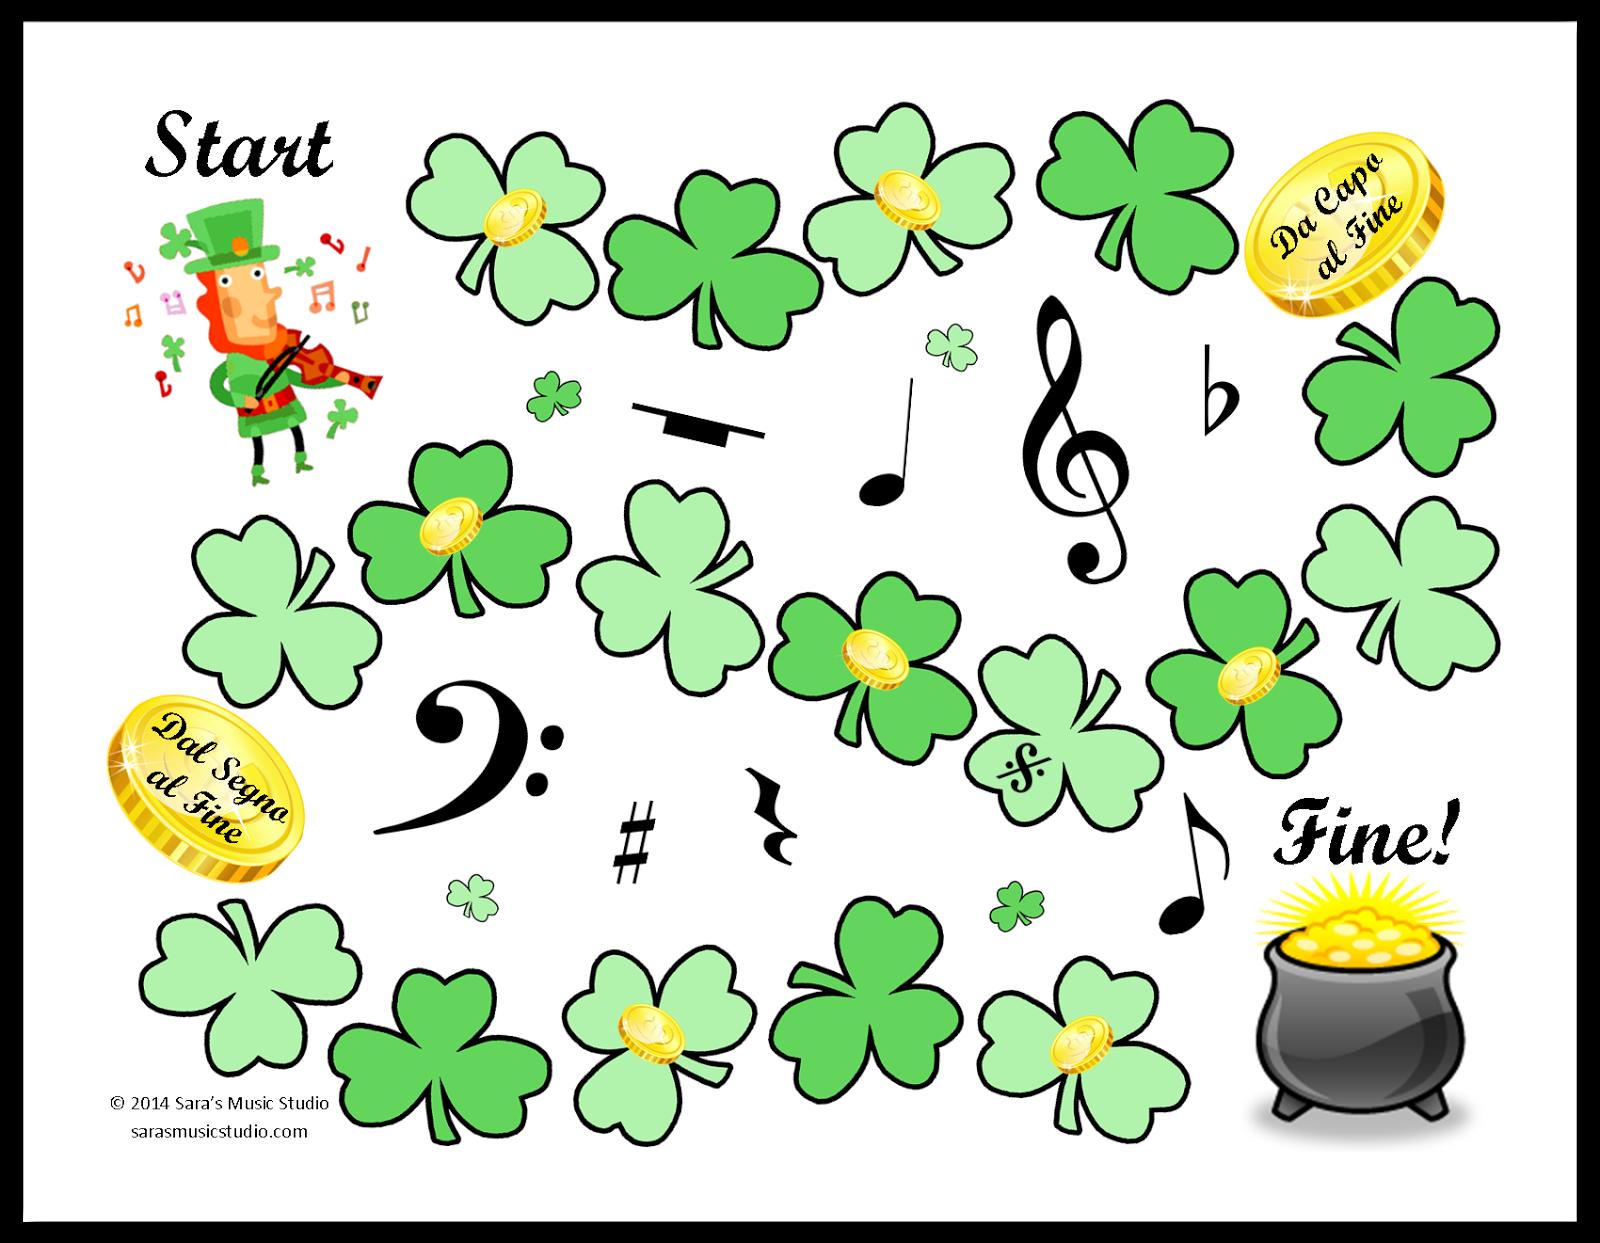 St Patricks Day Games For Kids